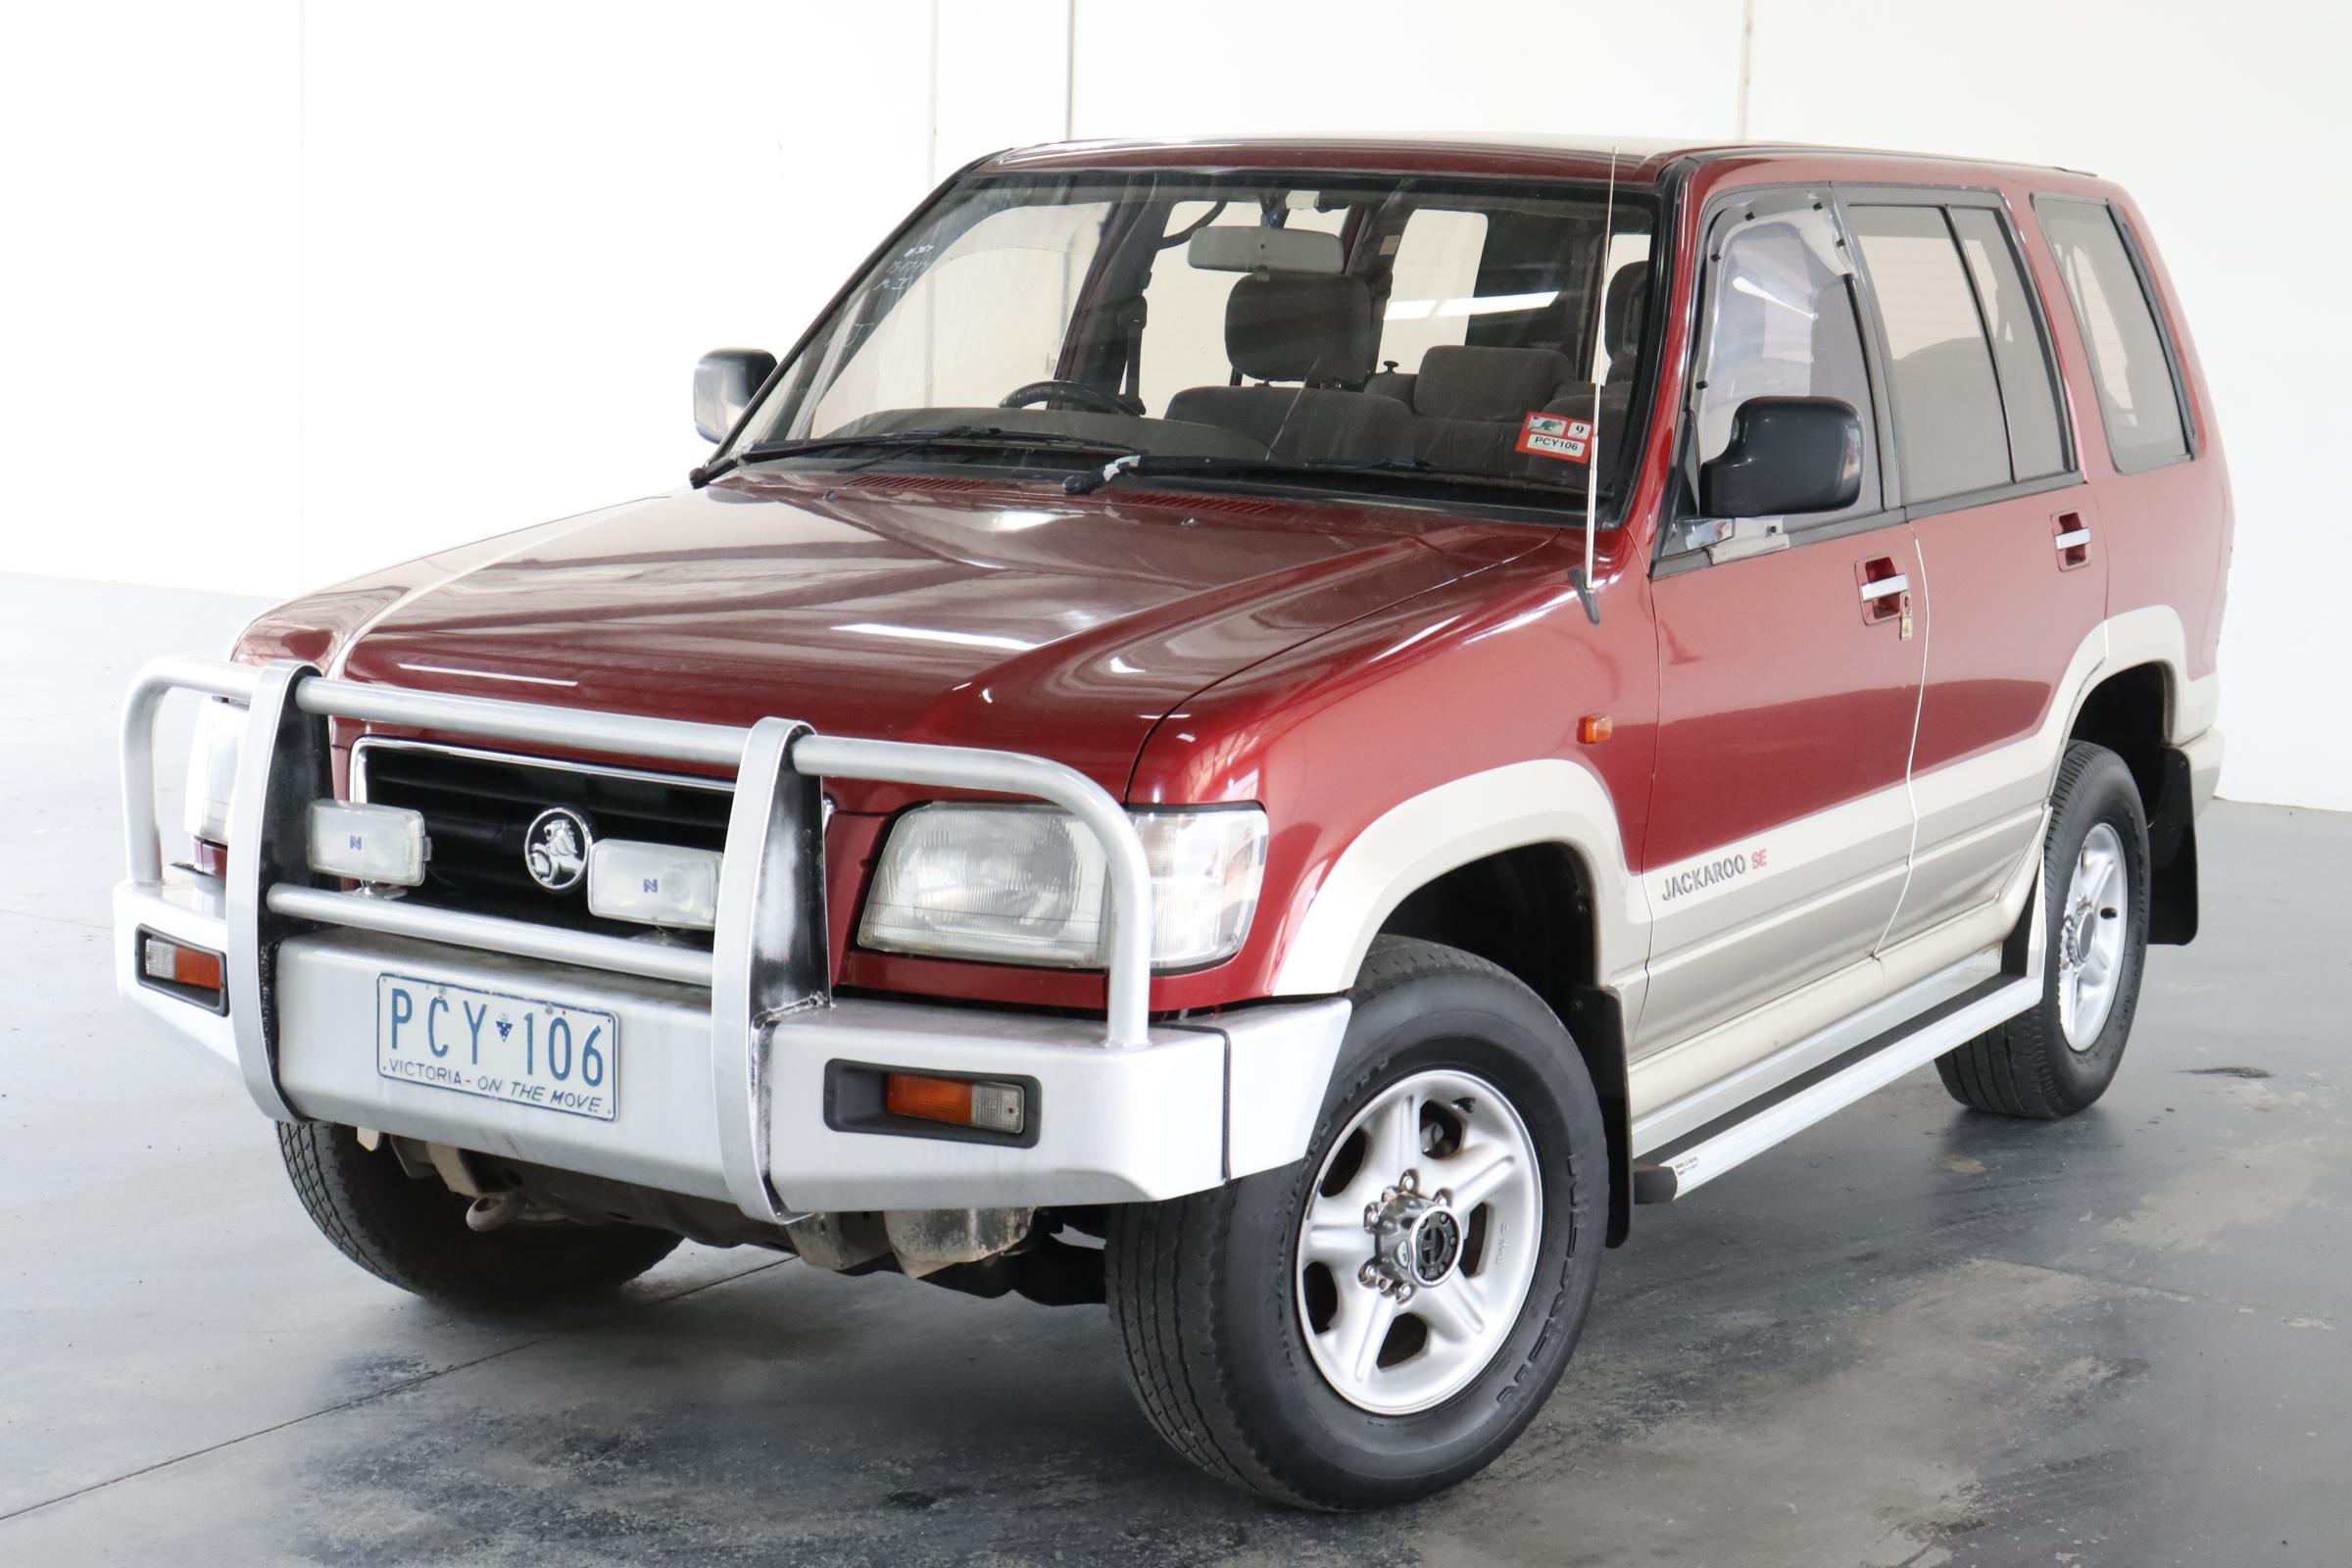 1998 Holden Jackaroo SE LWB (4x4) Automatic 7 Seats Wagon